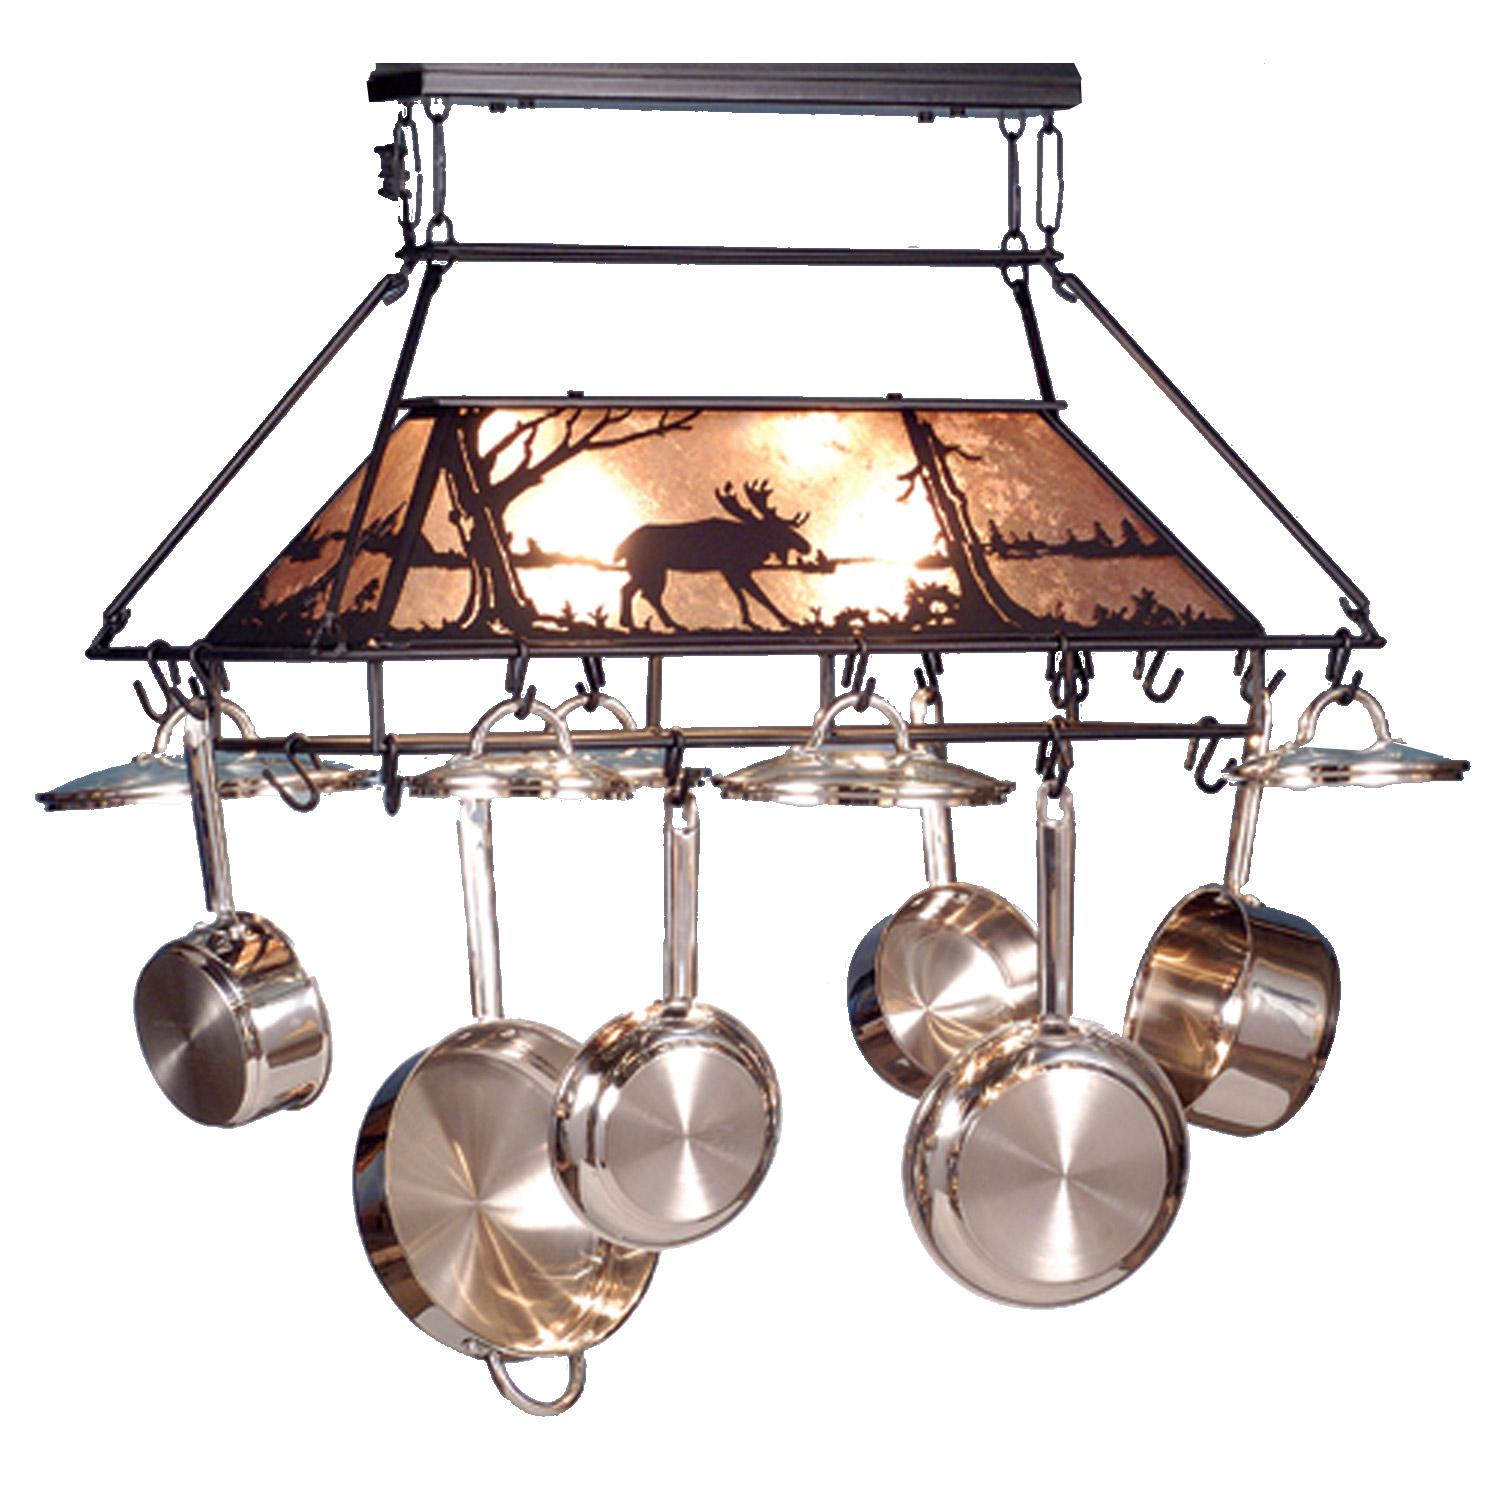 lighting island and billiards lighting pot racks meyda 73371. Black Bedroom Furniture Sets. Home Design Ideas